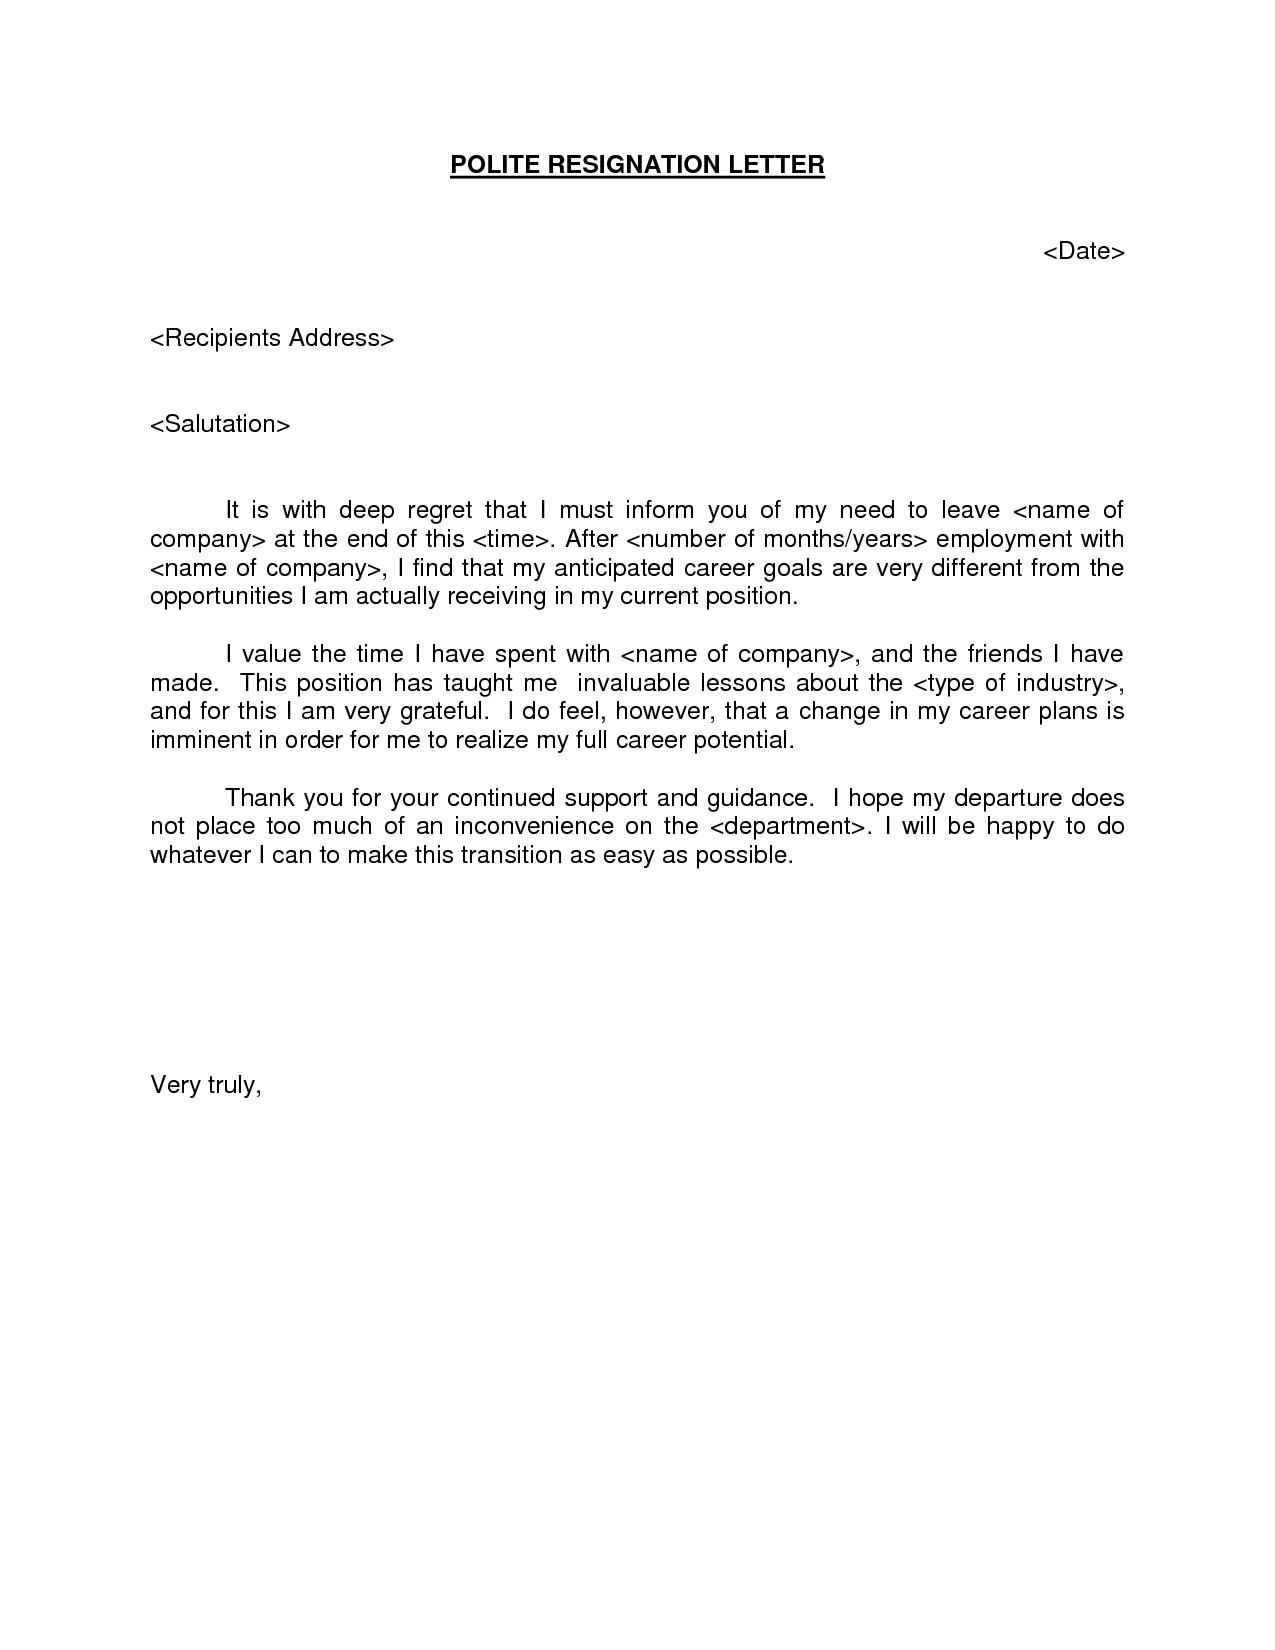 Reference Letter Template Pdf - Polite Resignation Letter Bestdealformoneywriting A Letter